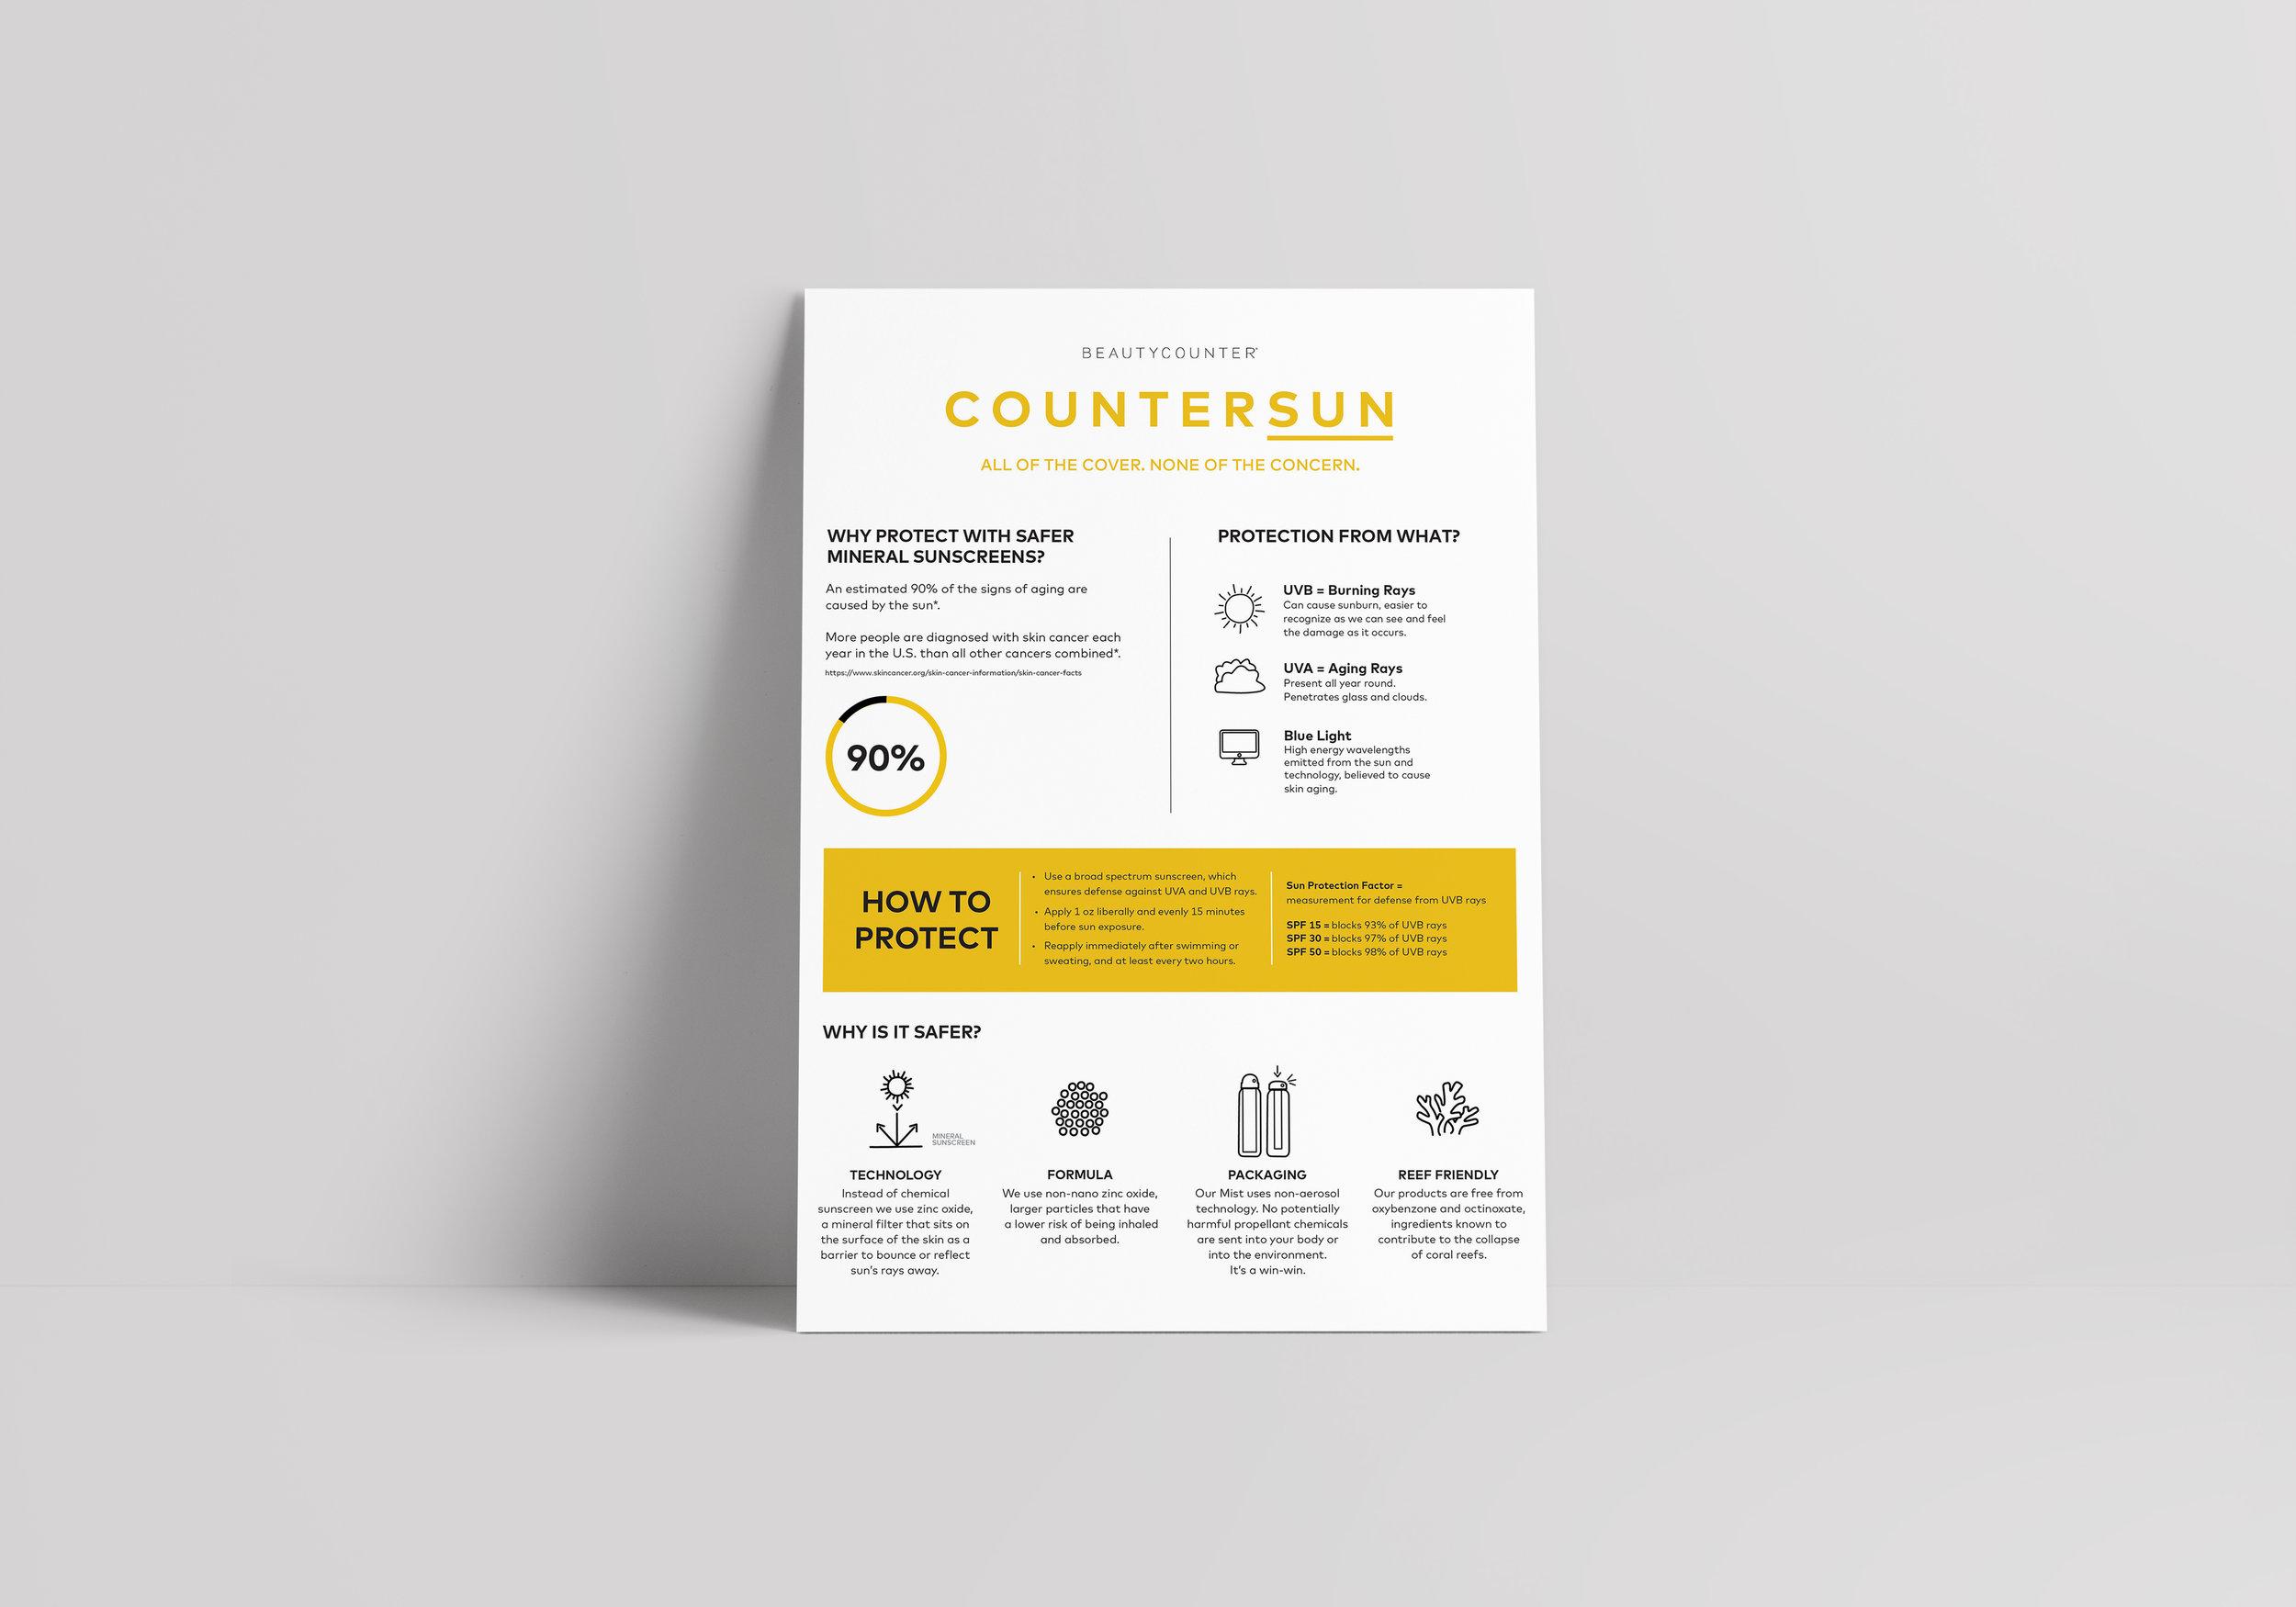 Countersun-Infographic.jpg